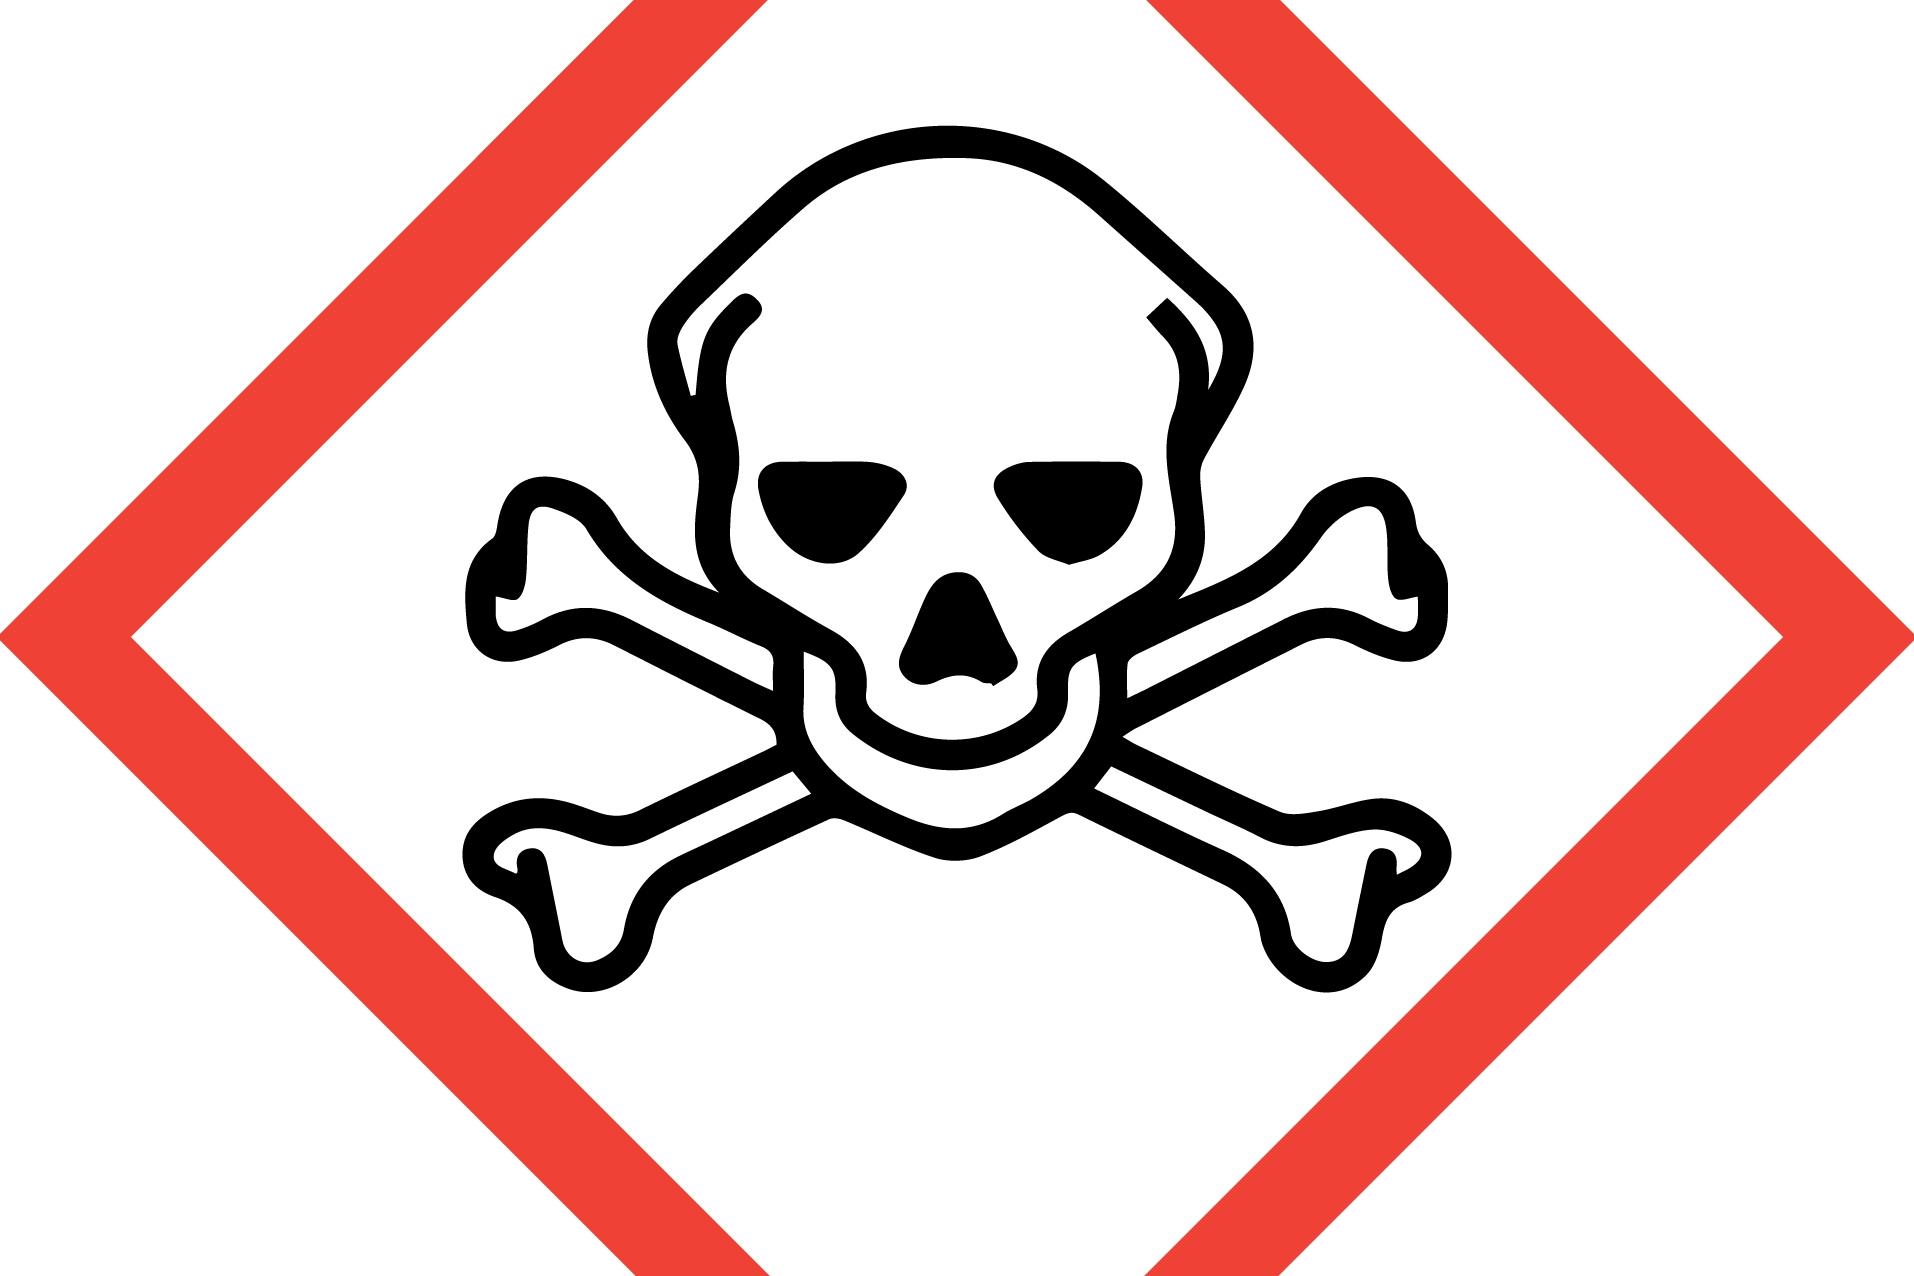 Household Hazardous Waste Collection - Sustainable Whanganui